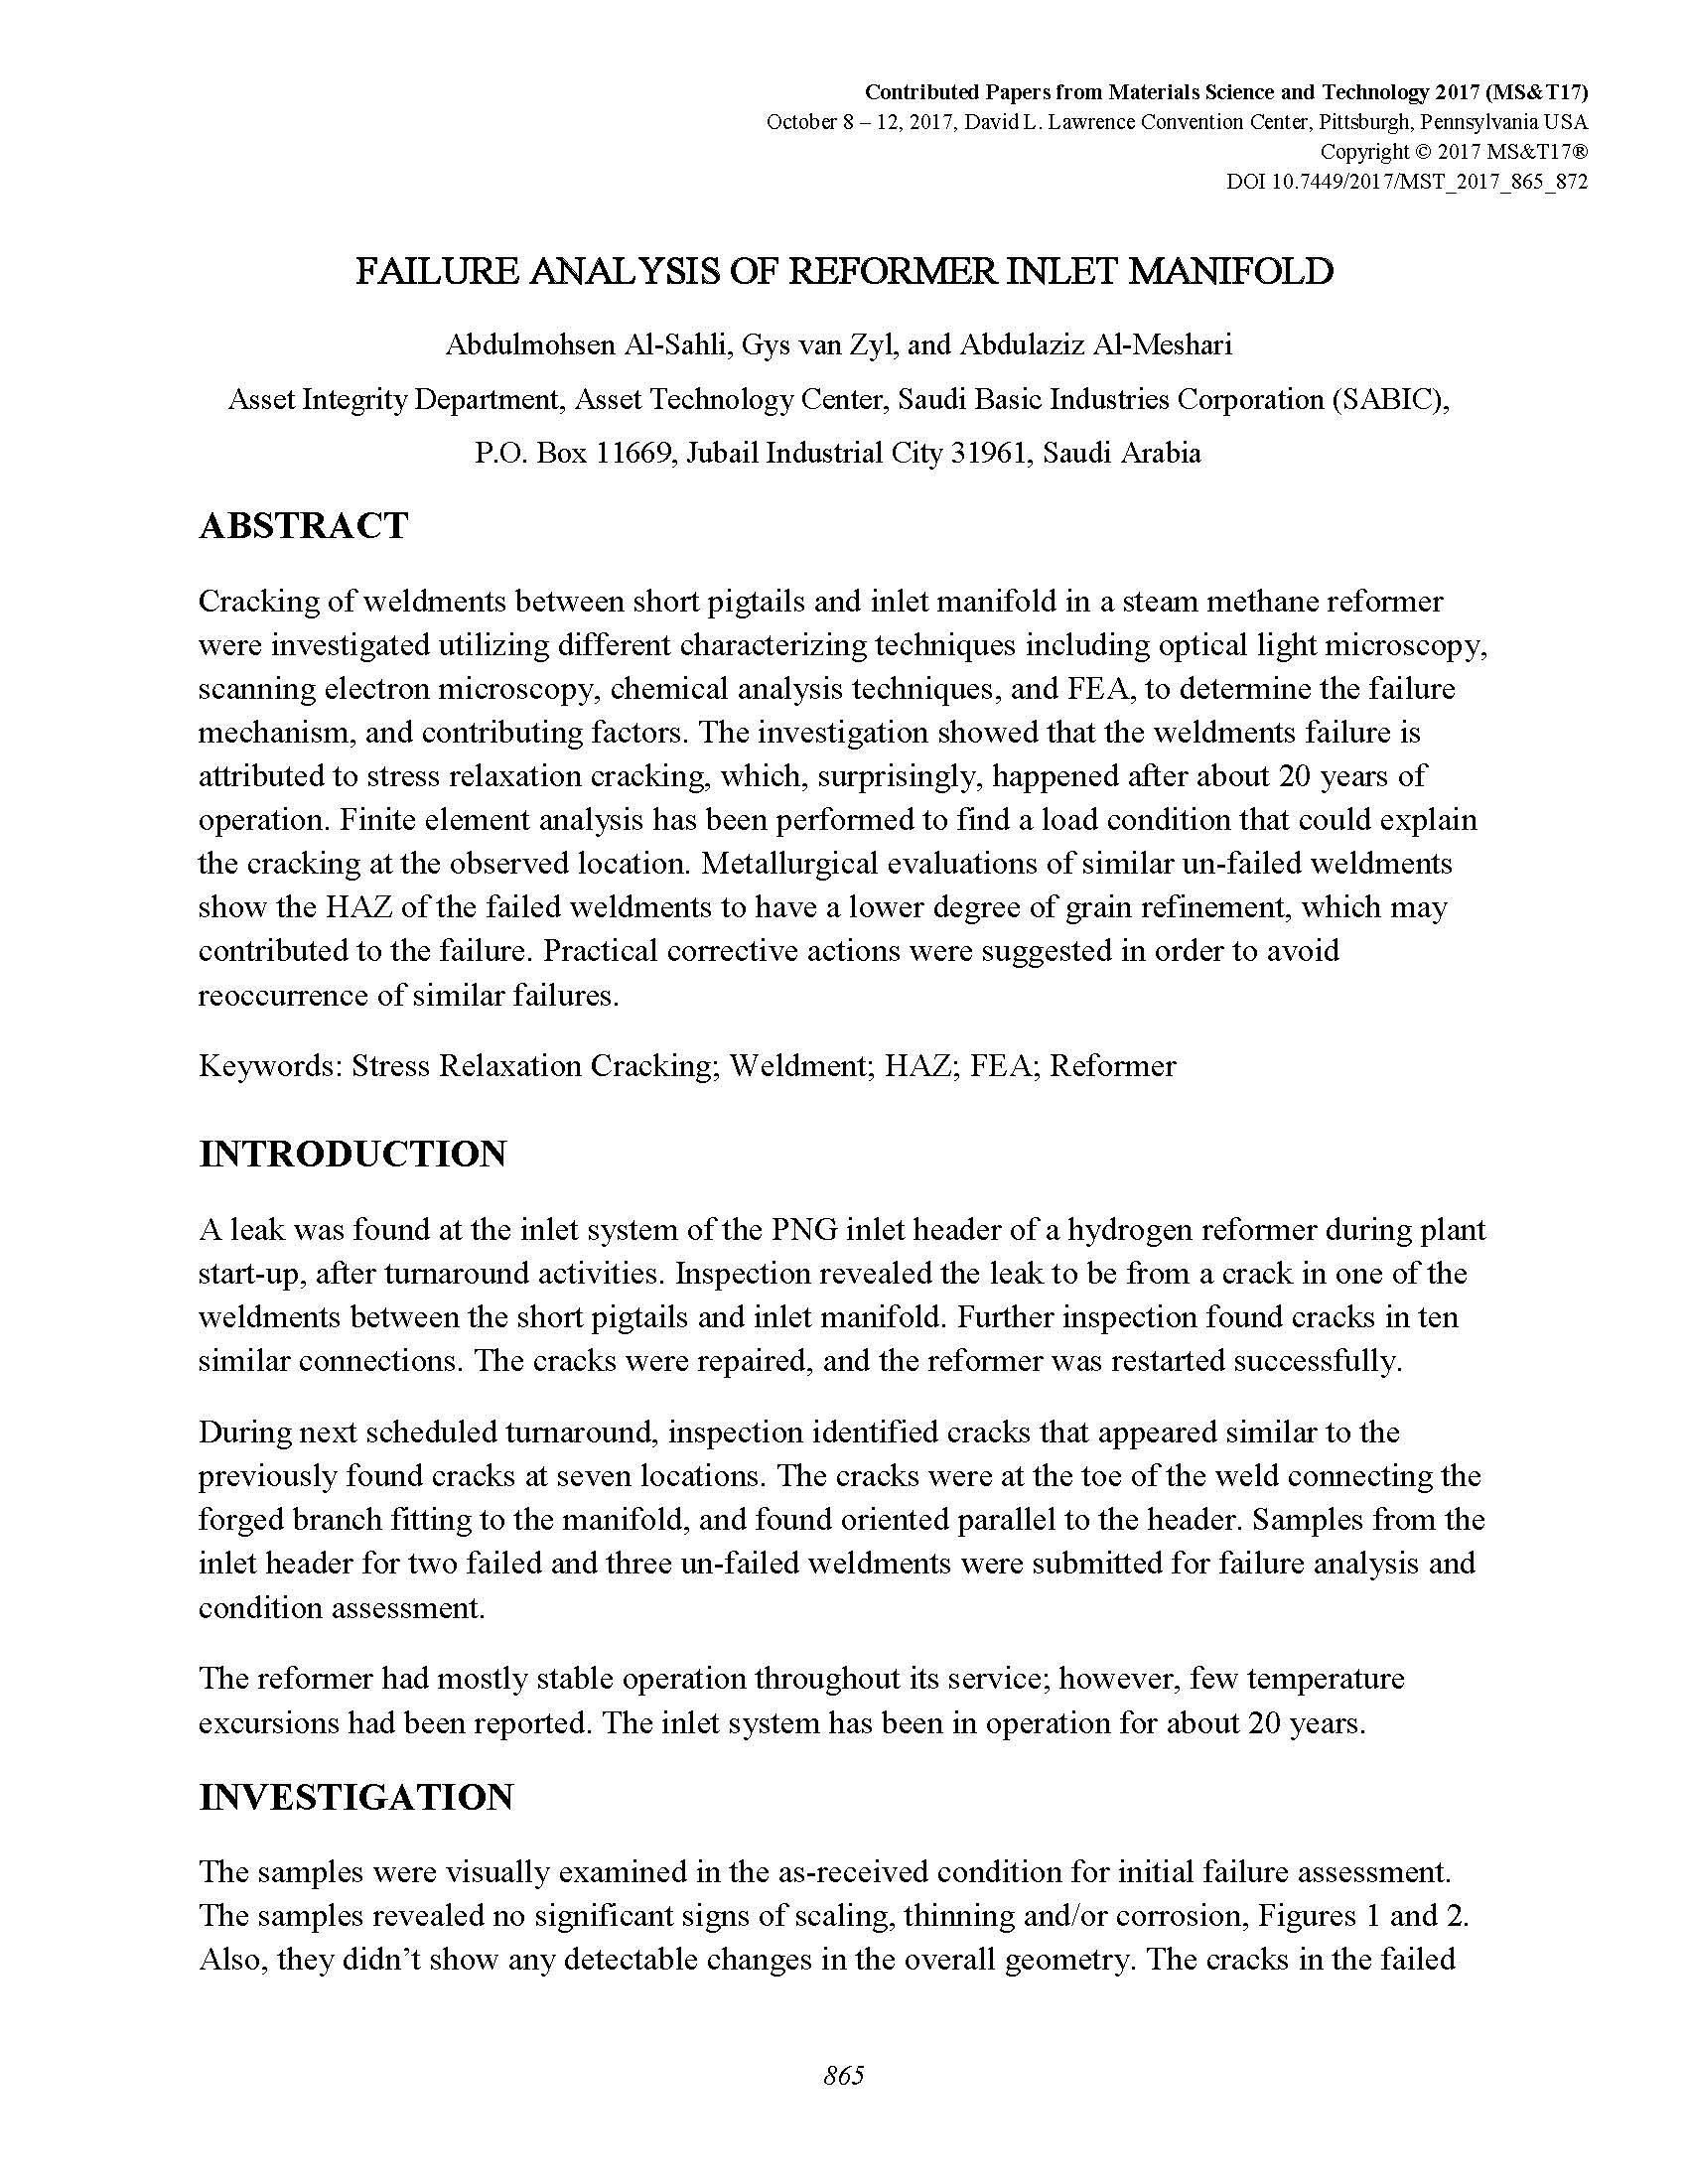 Failure Analysis of Reformer Inlet Manifold